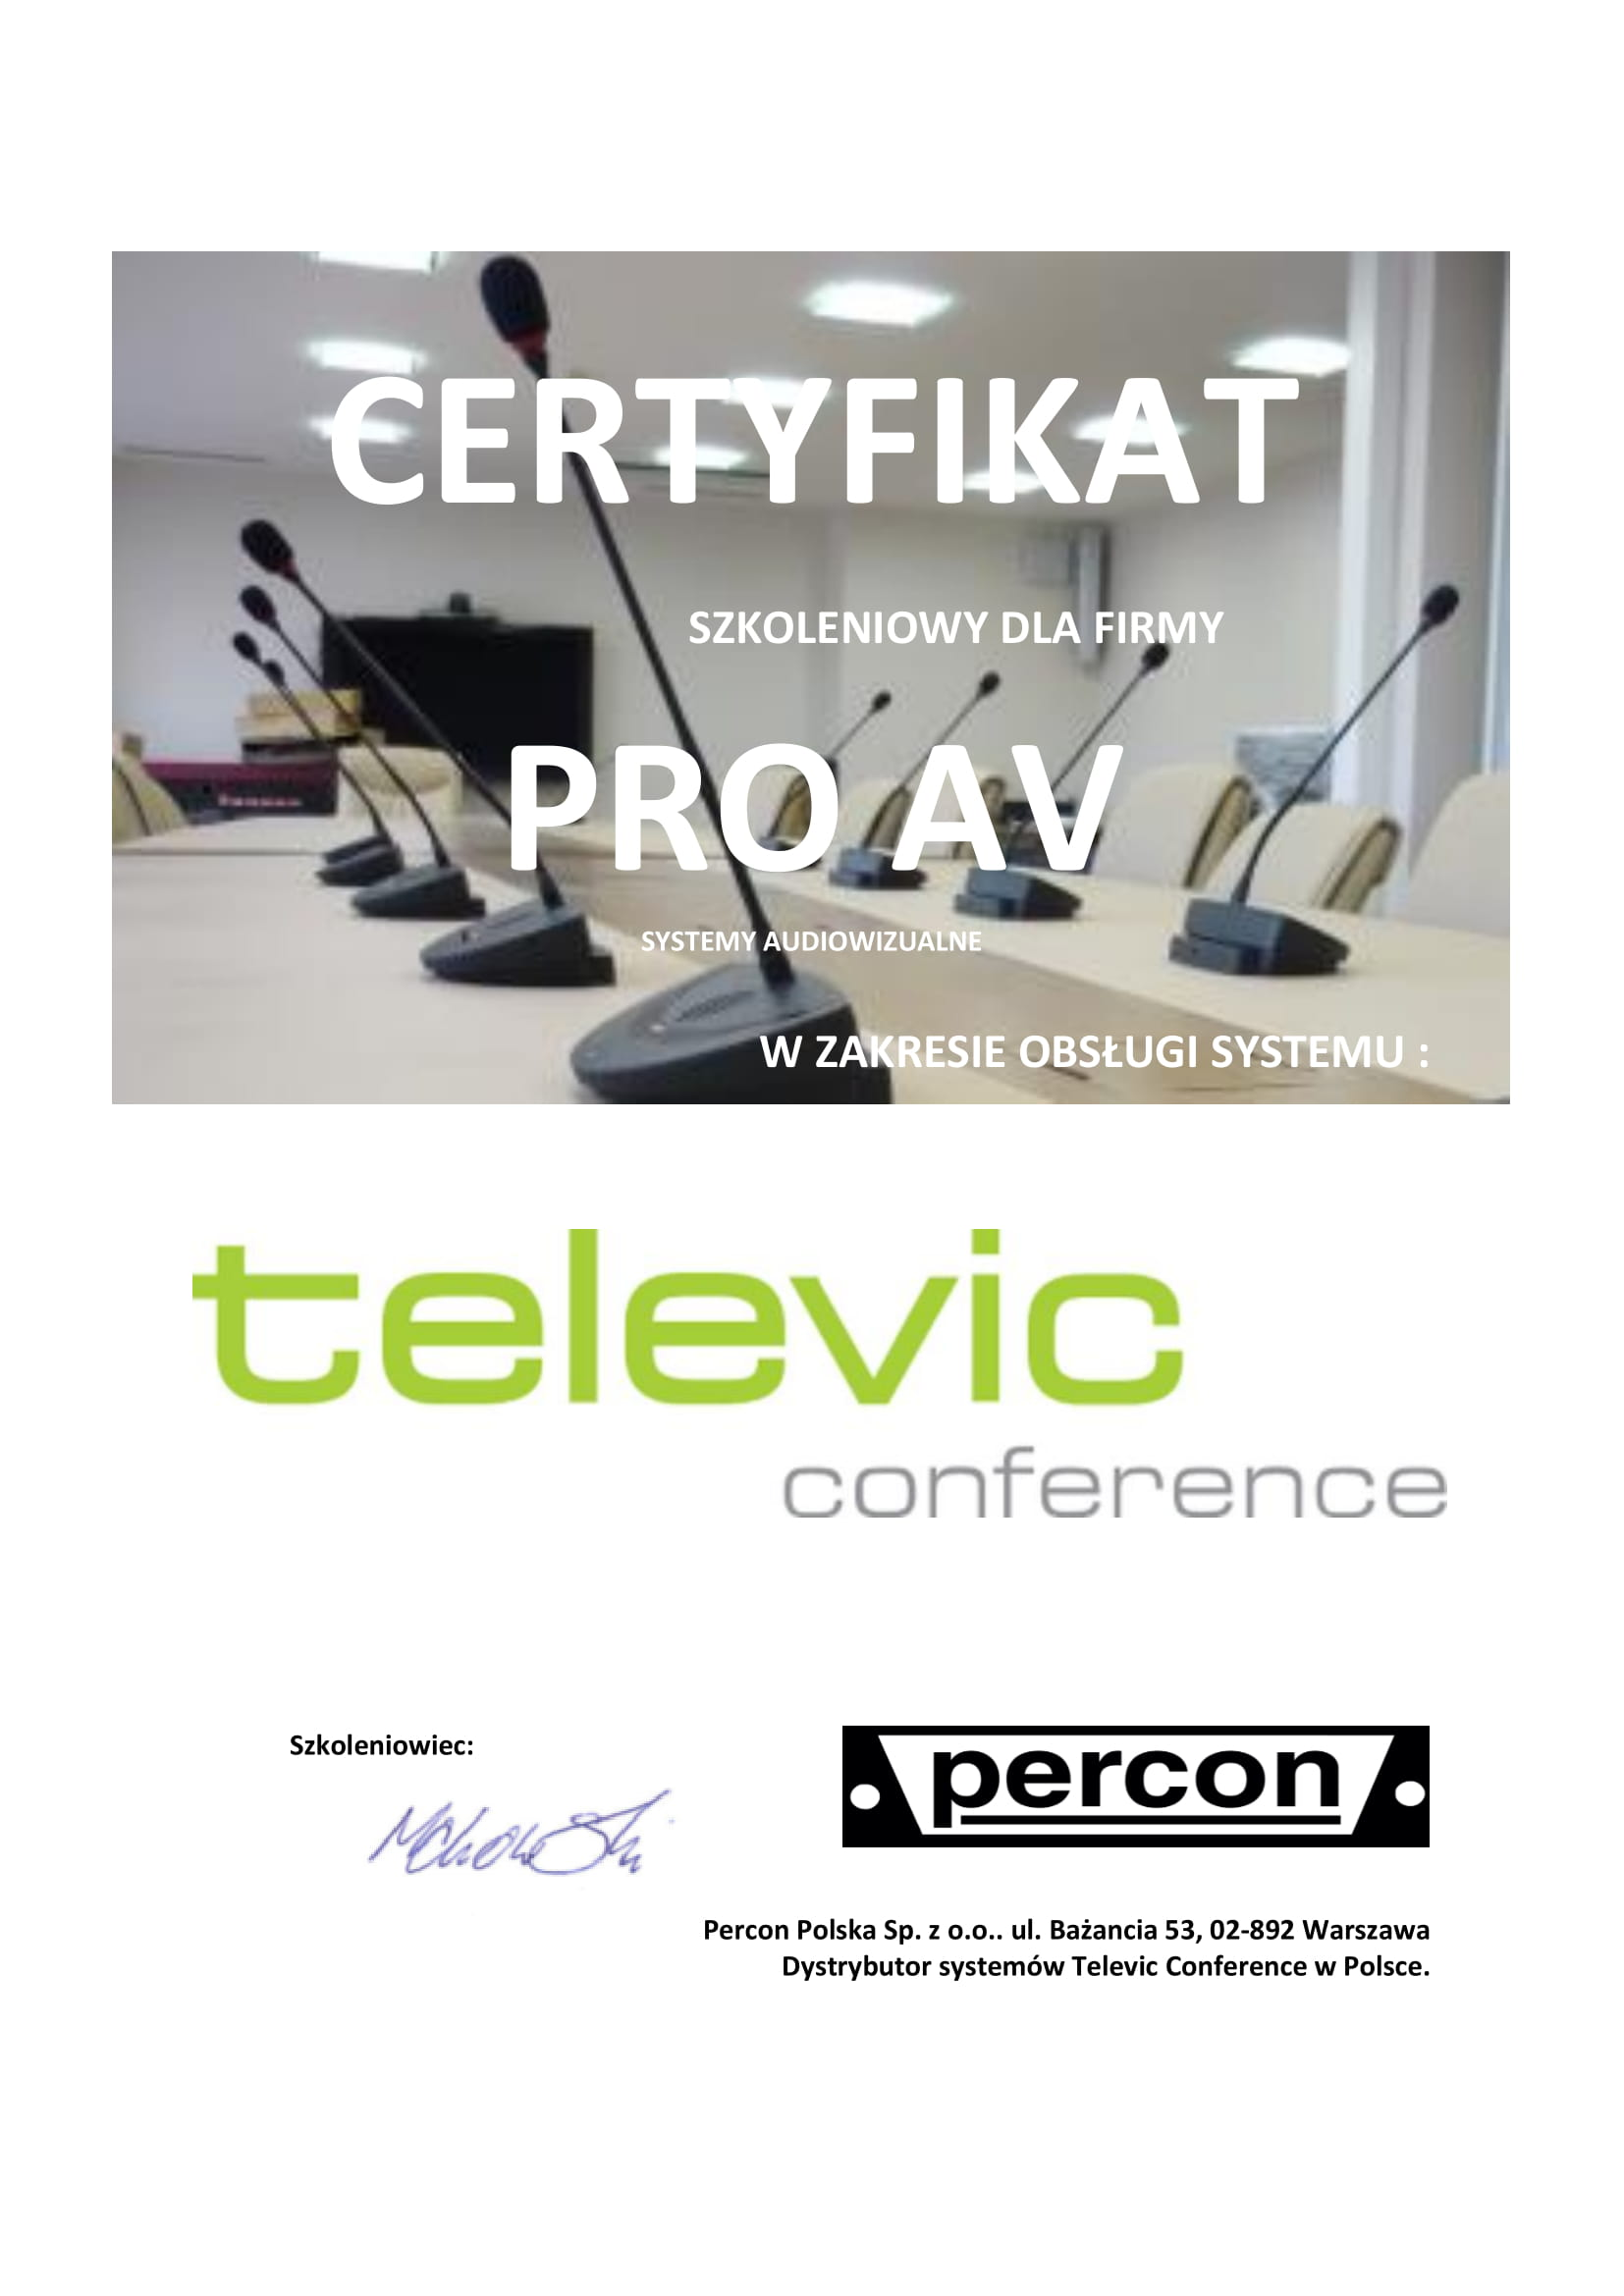 Certyfikat Televic